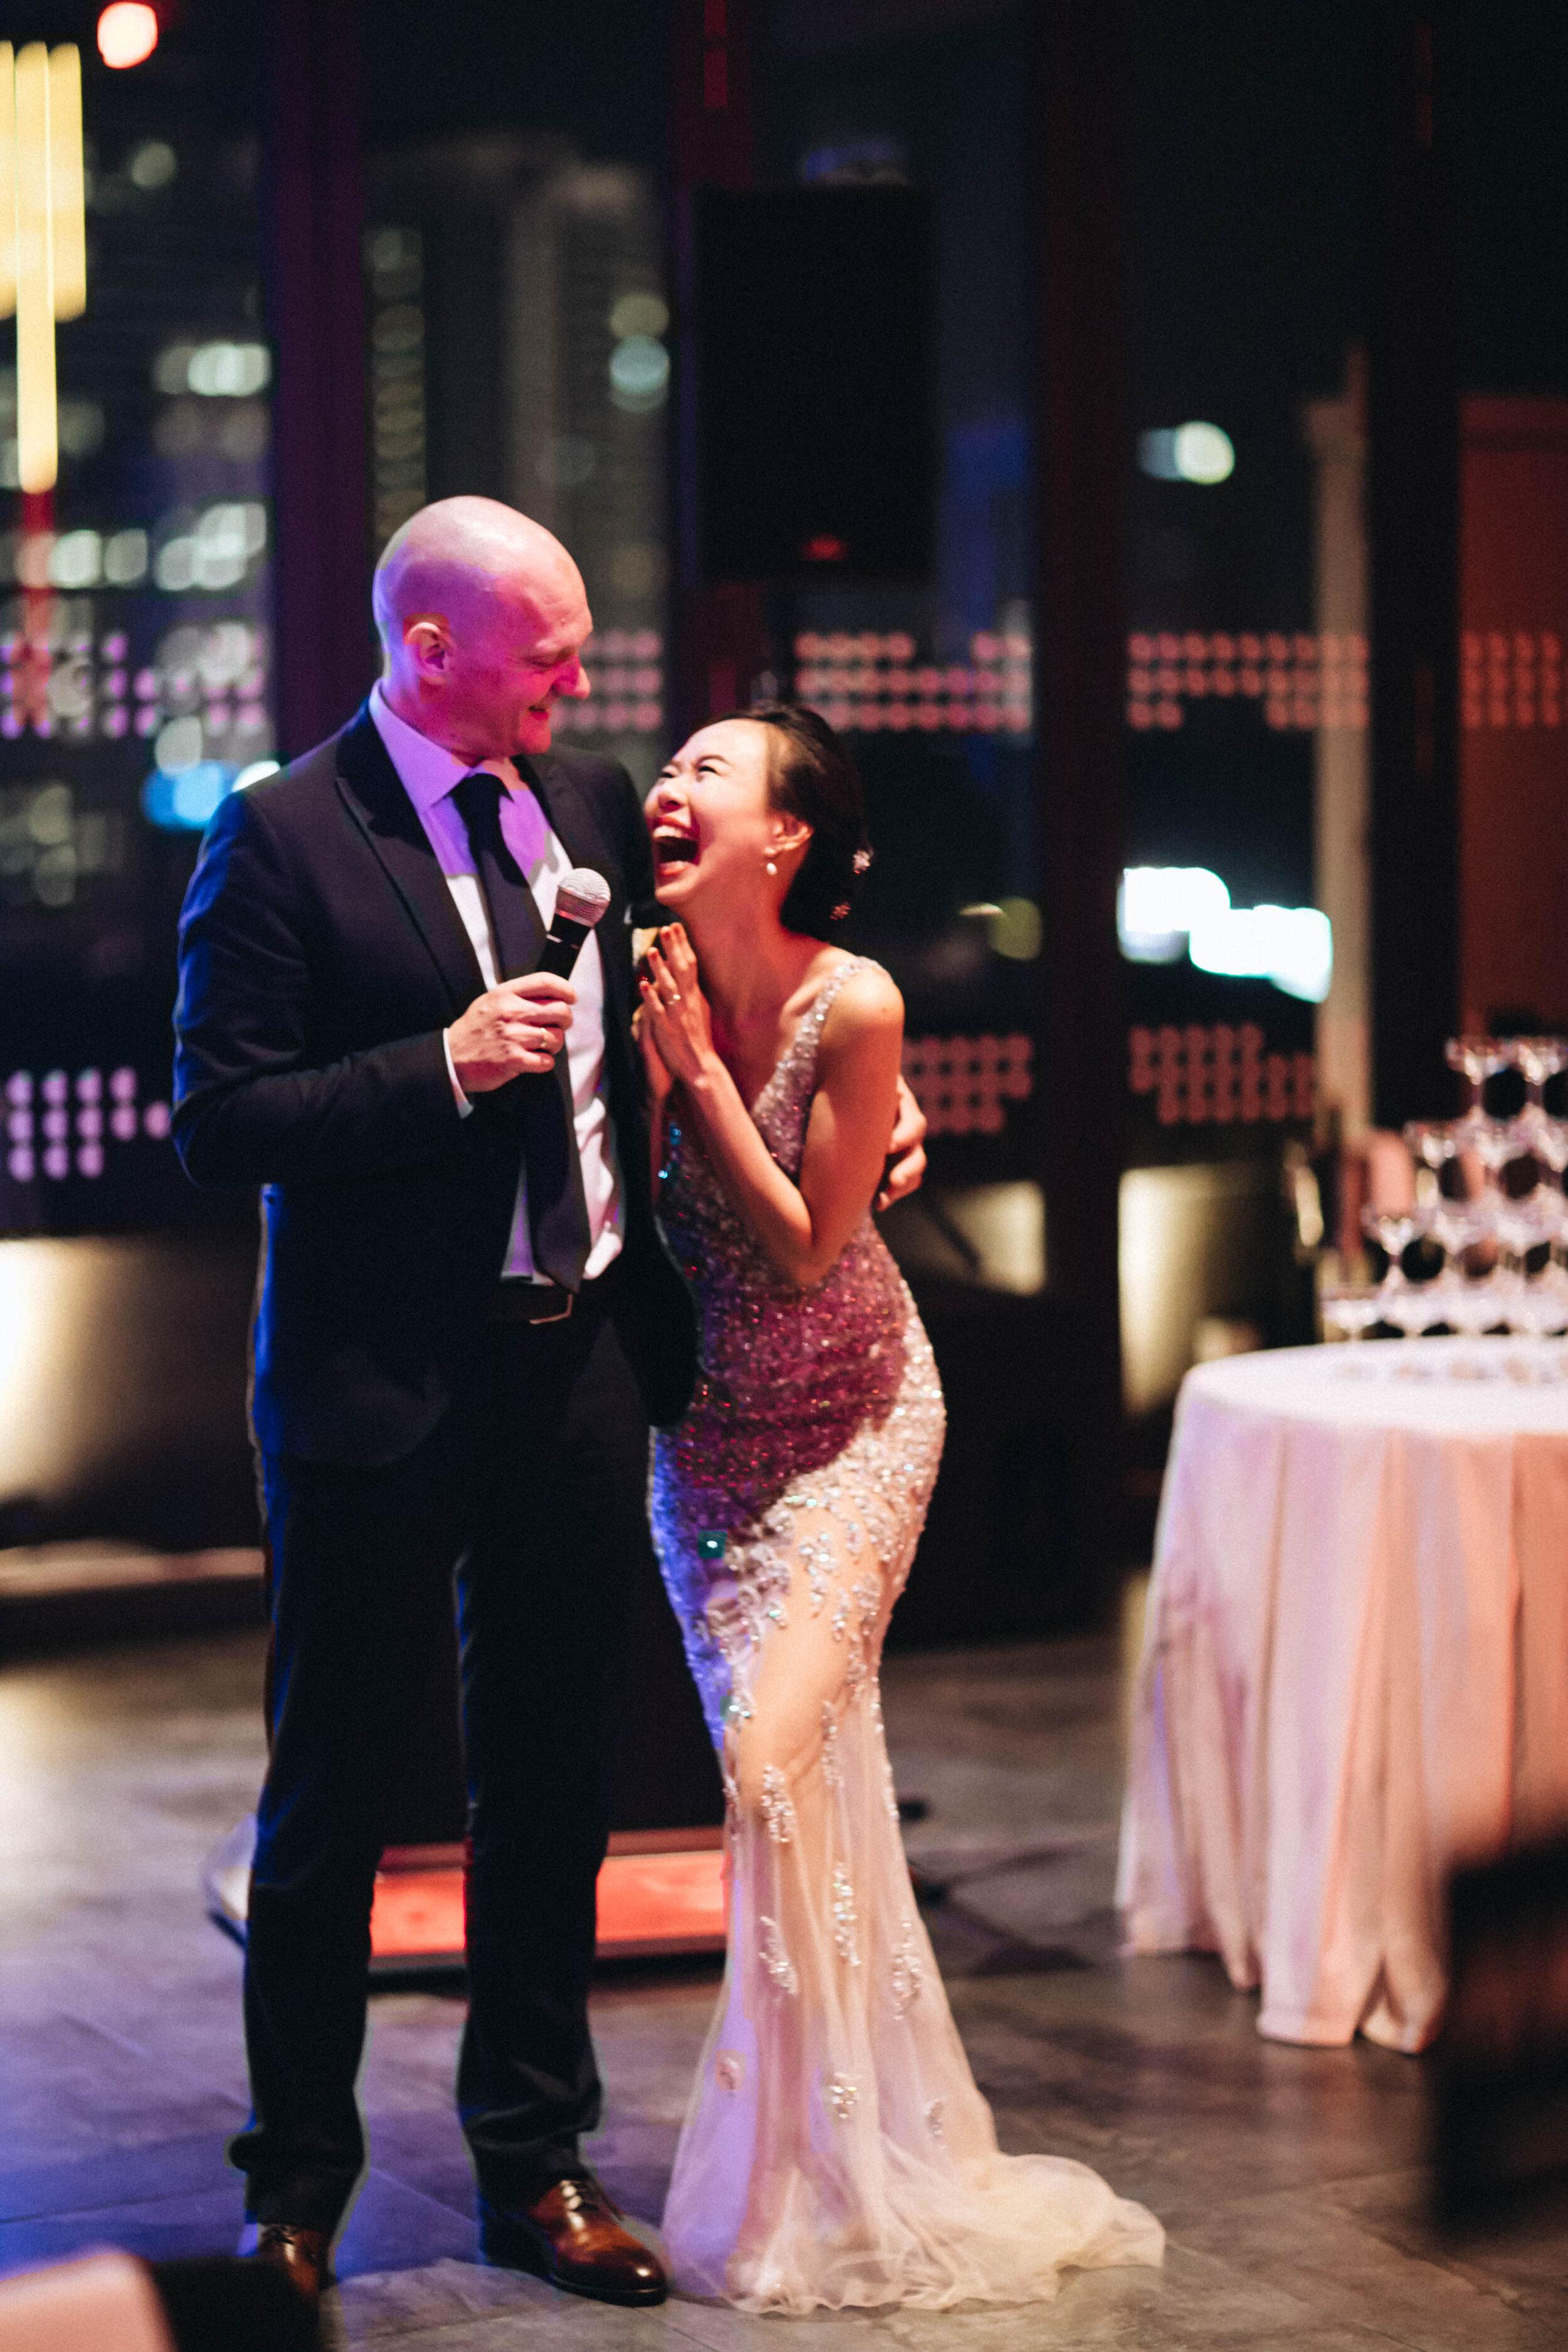 Dan & dawn - Church Wedding & Dinner Reception at Le Meridien Kuala Lumpur